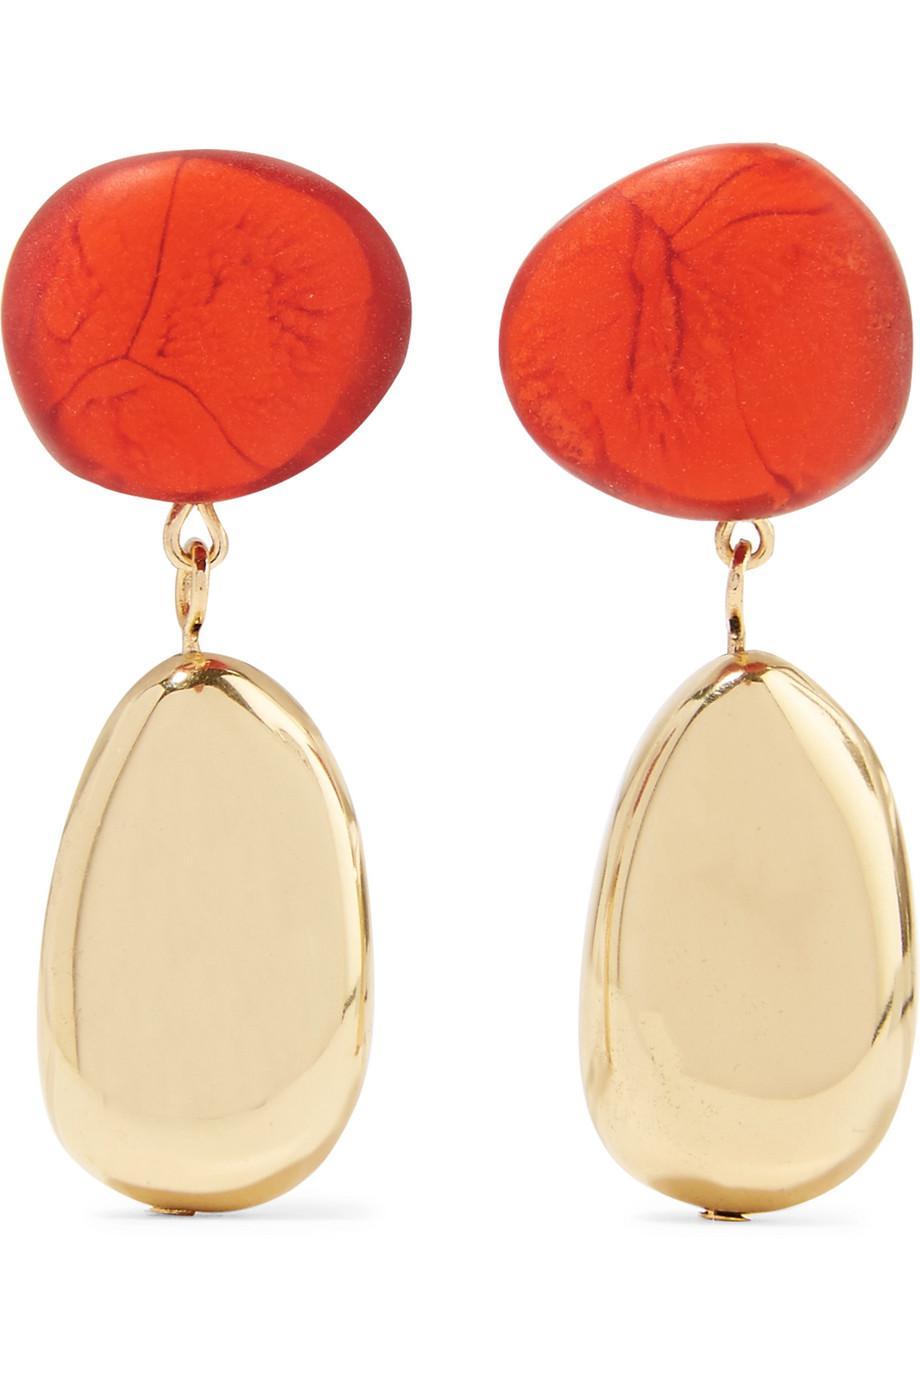 Dinosaur Designs Gold-tone Resin Earrings - Orange AqZVlsCm